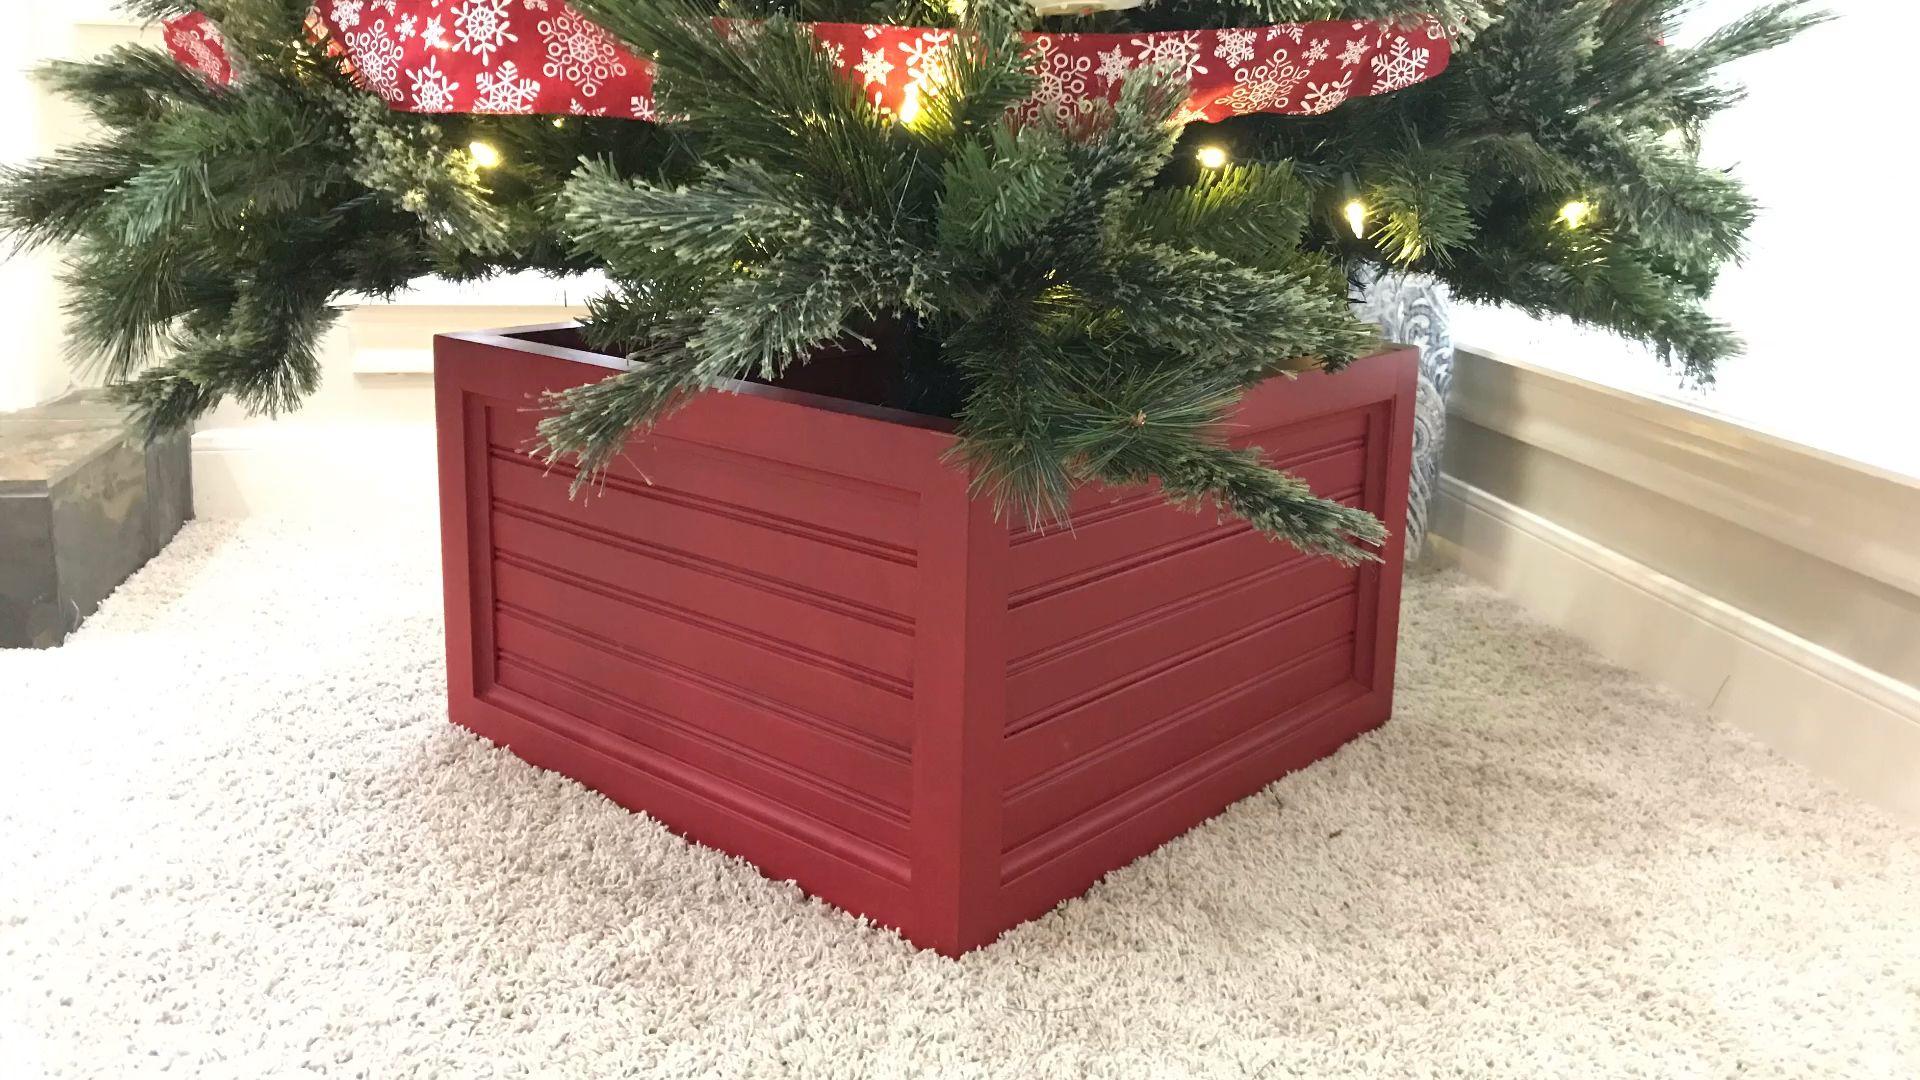 Diy Christmas Tree Box Stand And Ornament Storage Abbotts At Home Video Video Christmas Tree Box Stand Christmas Tree Box Diy Christmas Tree